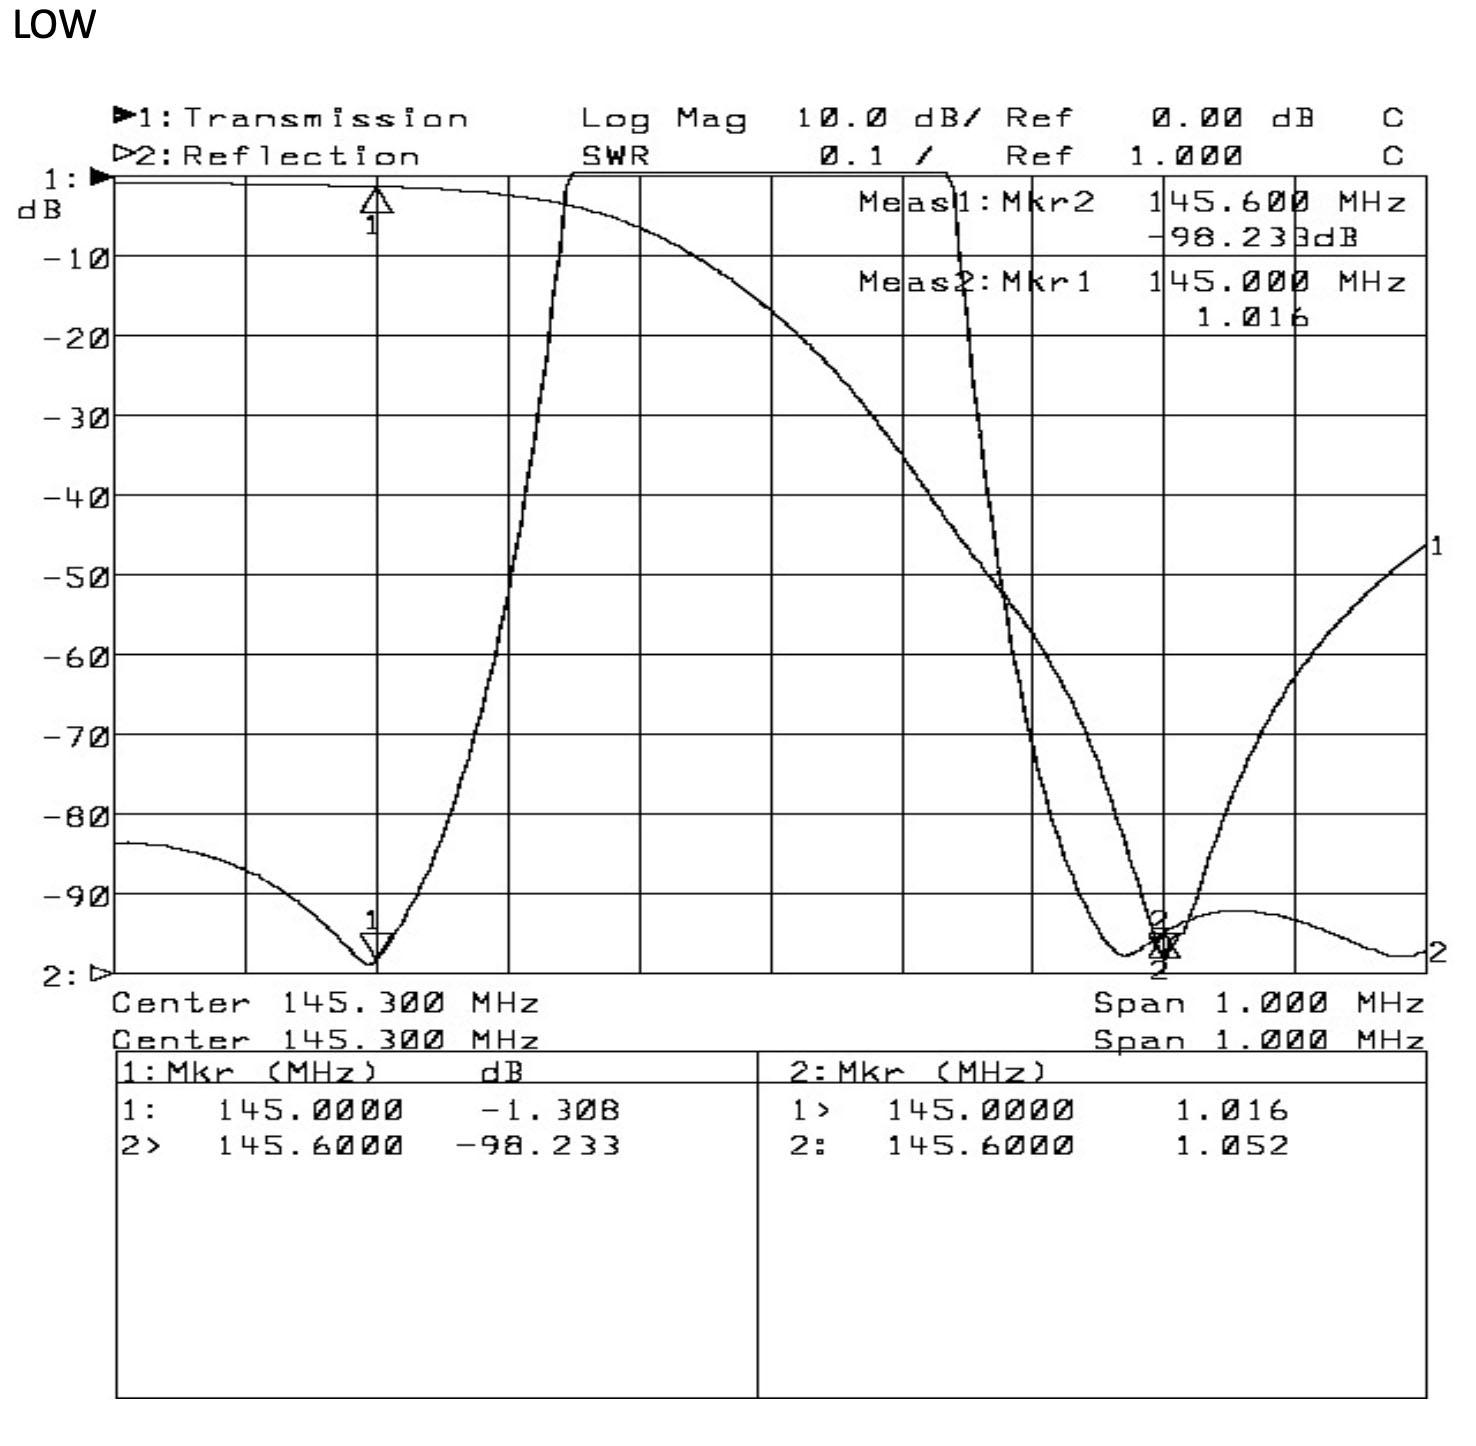 spectrum analyser plot - low